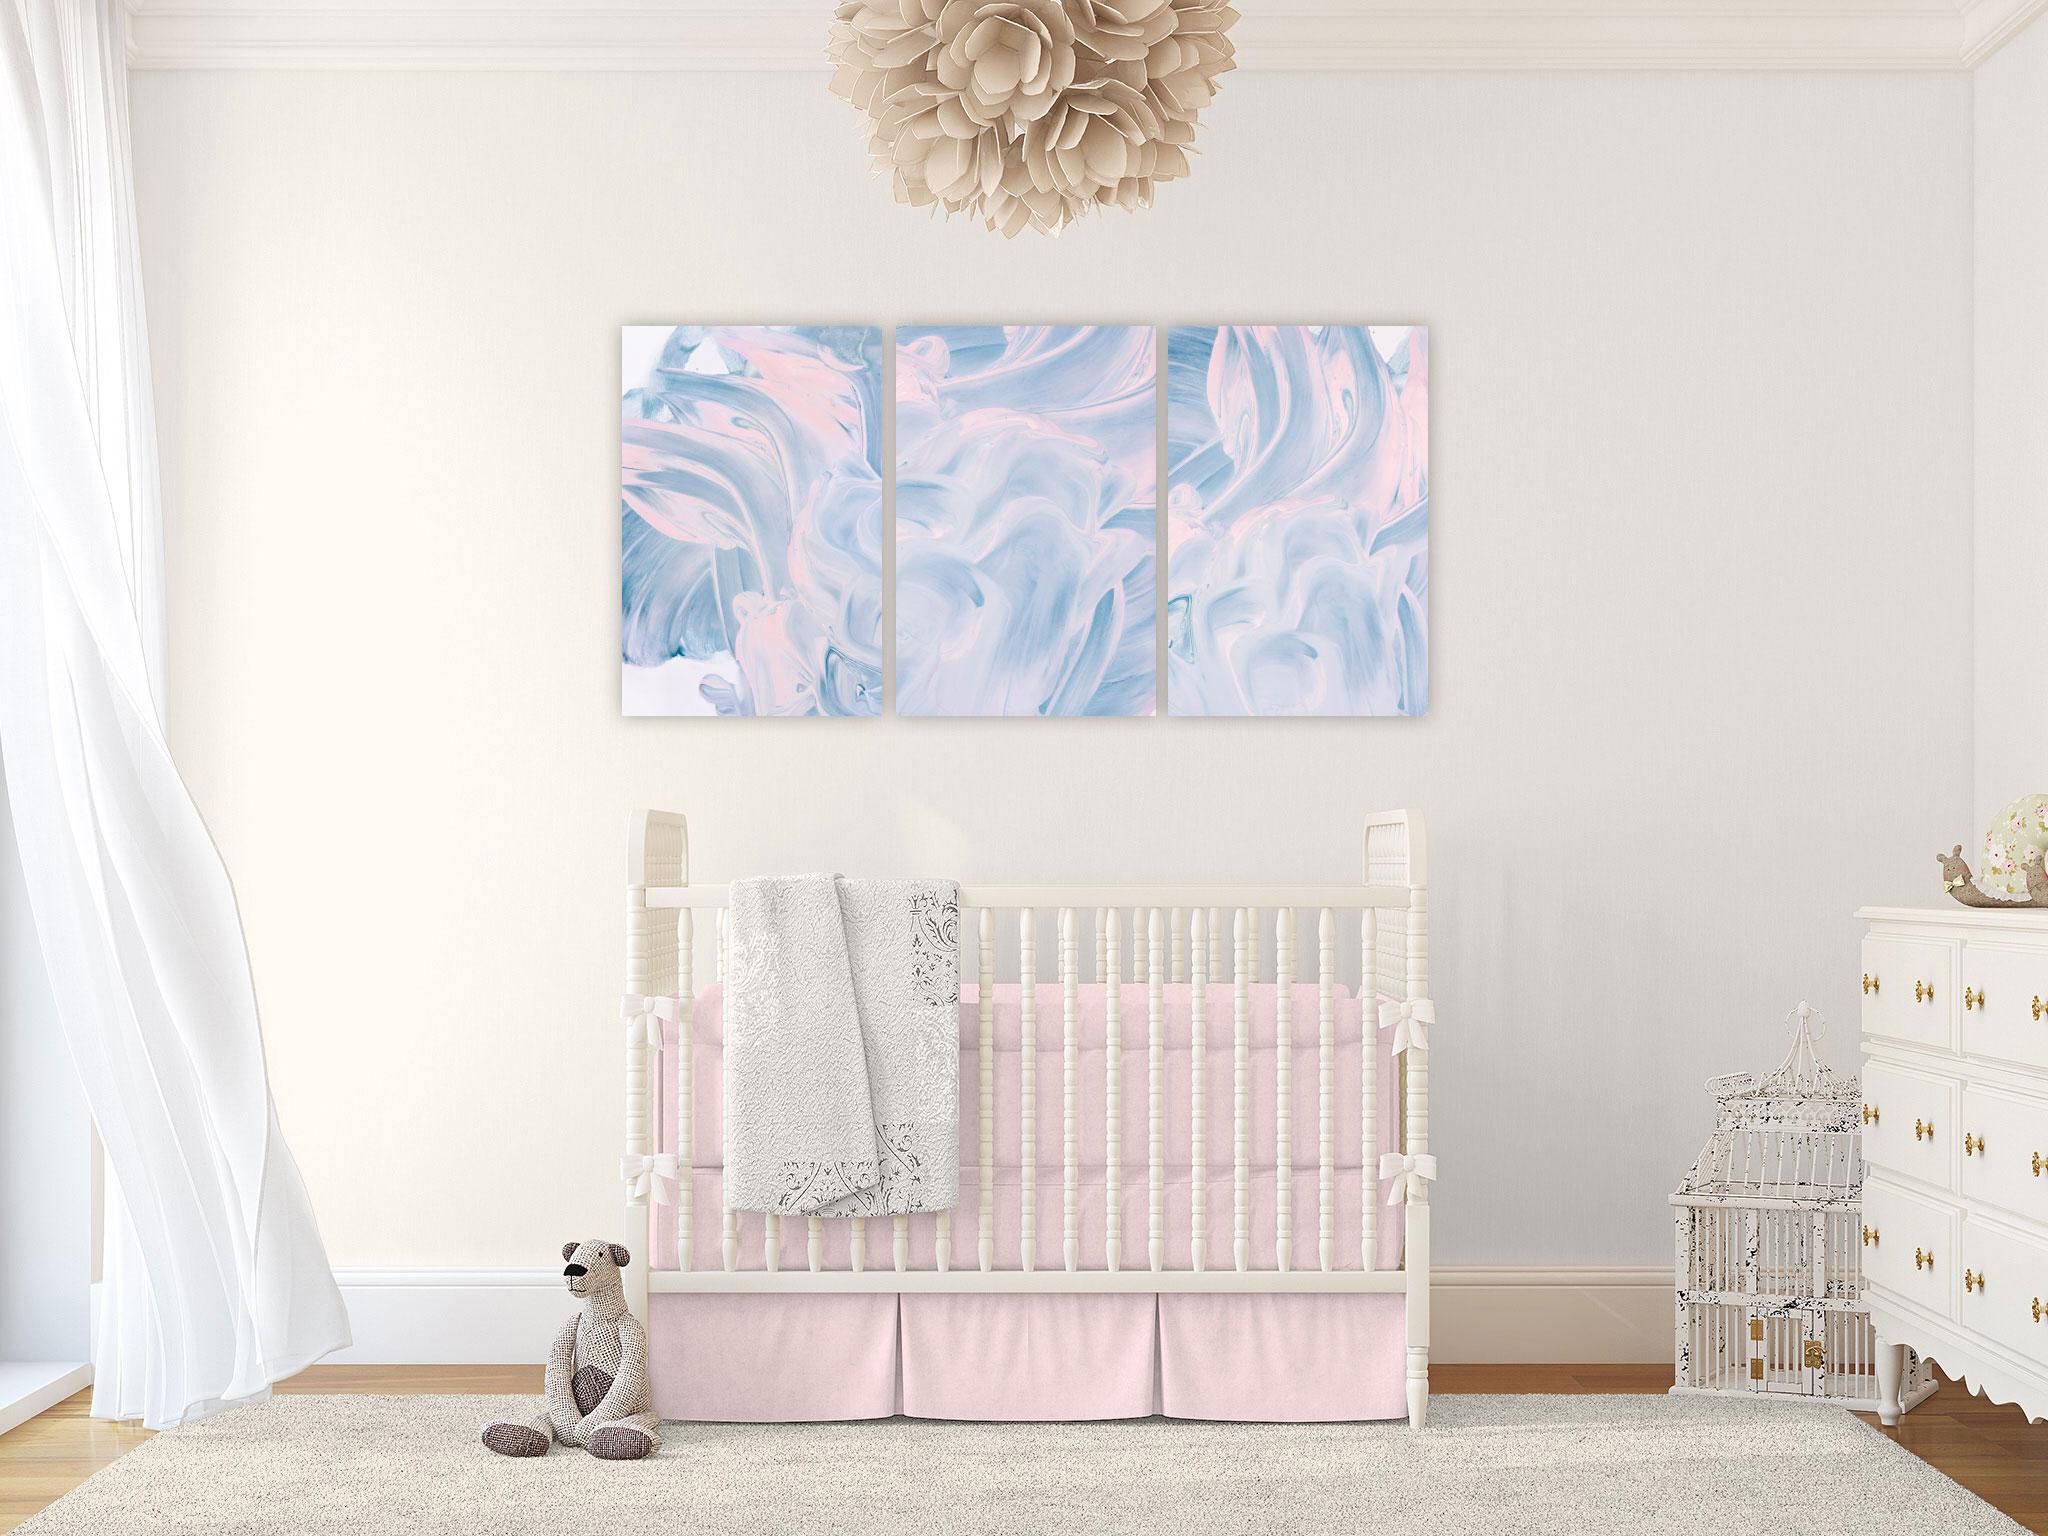 Andrea-Burolla-Photography-Denver-childrens-photographer-kids-paint-session-abstract-art-baby-nursery-custom